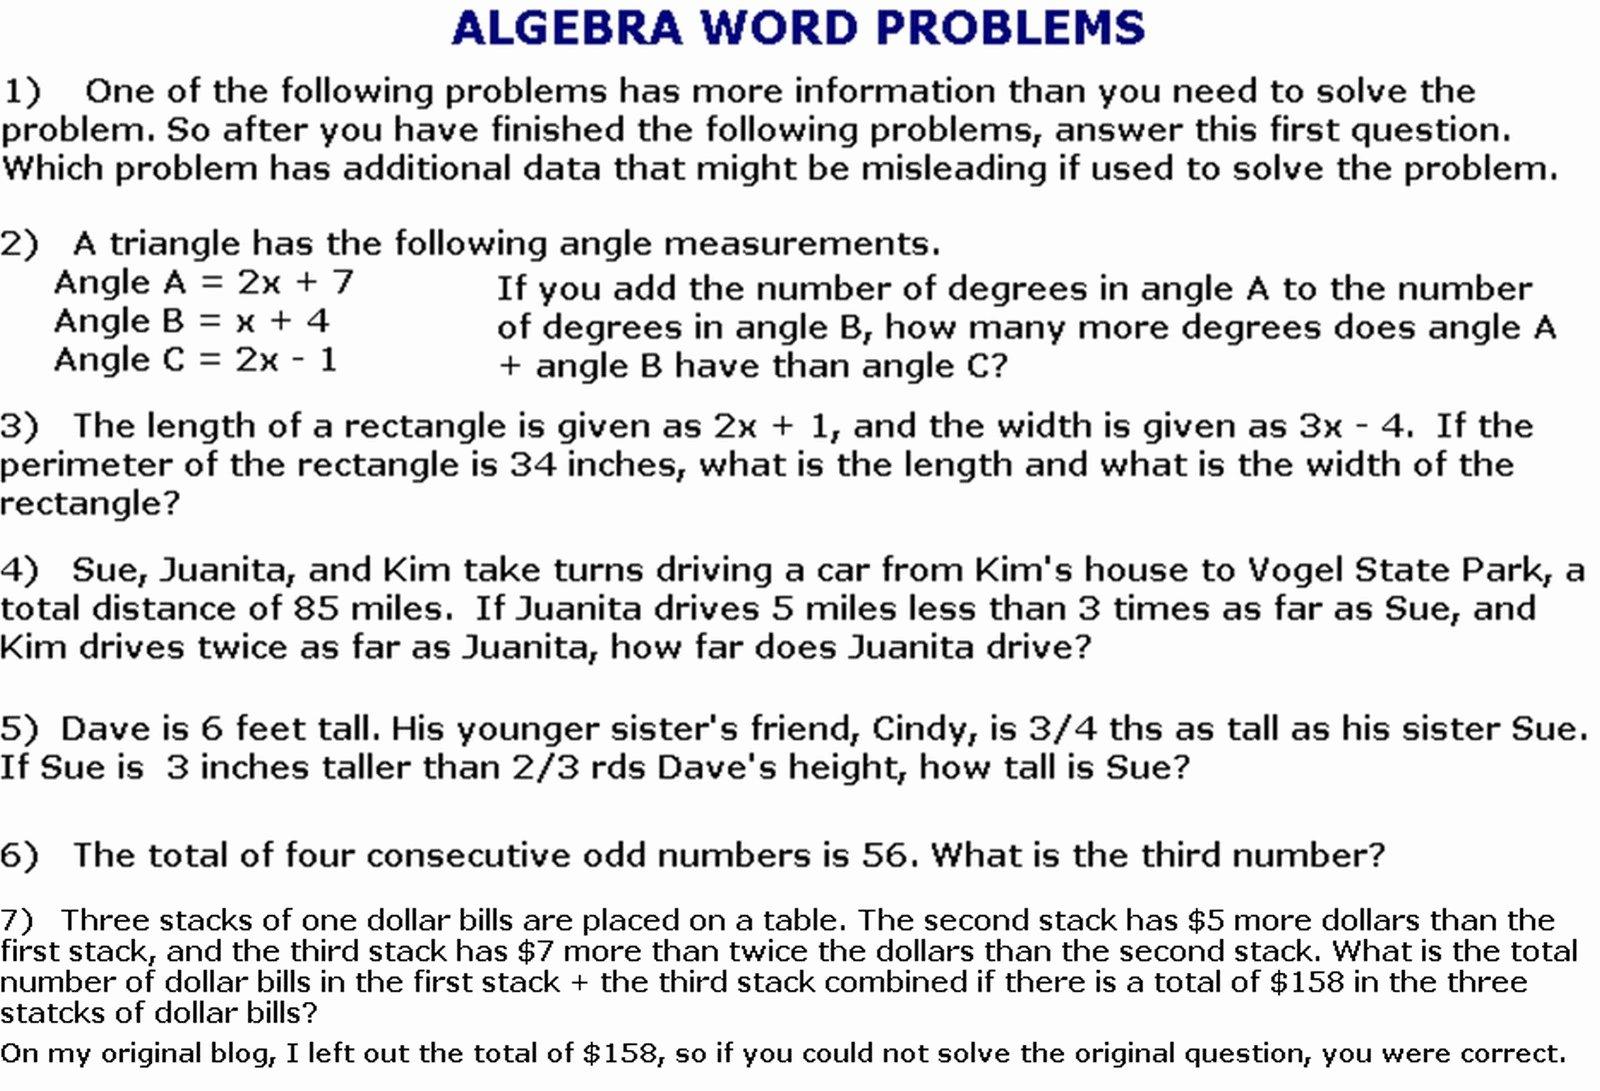 Algebra Word Problems Worksheet Pdf Unique Quadratic Equations Word Problems Worksheet Pdf